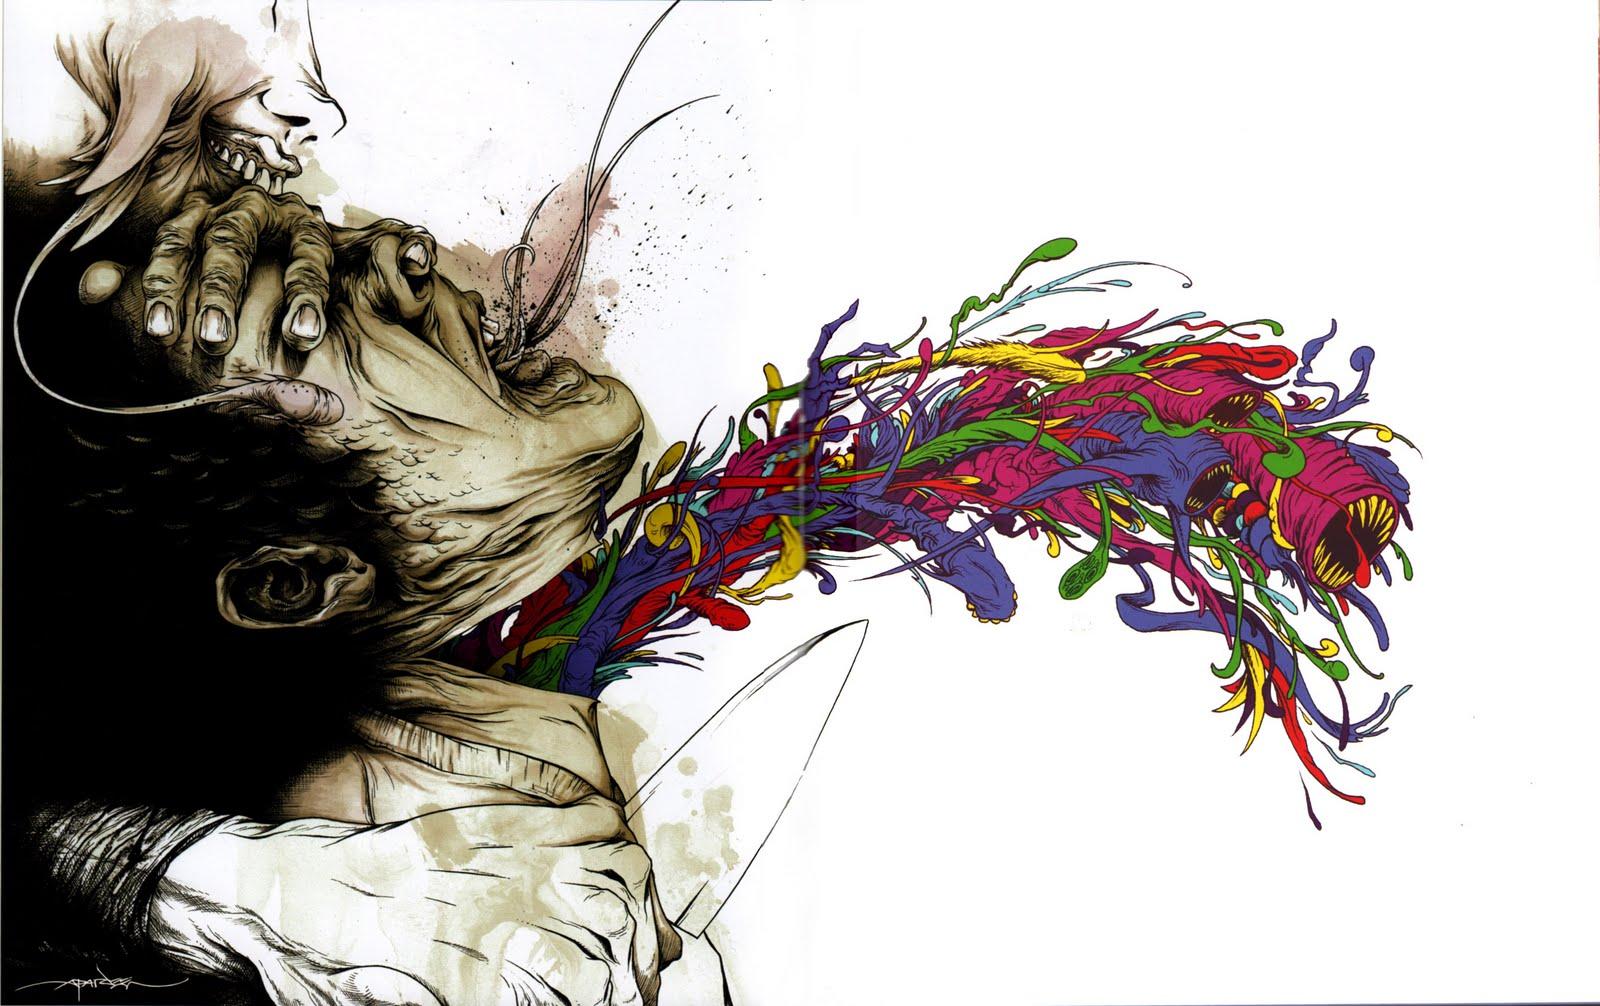 Journey Beyond The Comfort Zone - The Fantastical Art of Alex PardeeFamous Disturbing Art